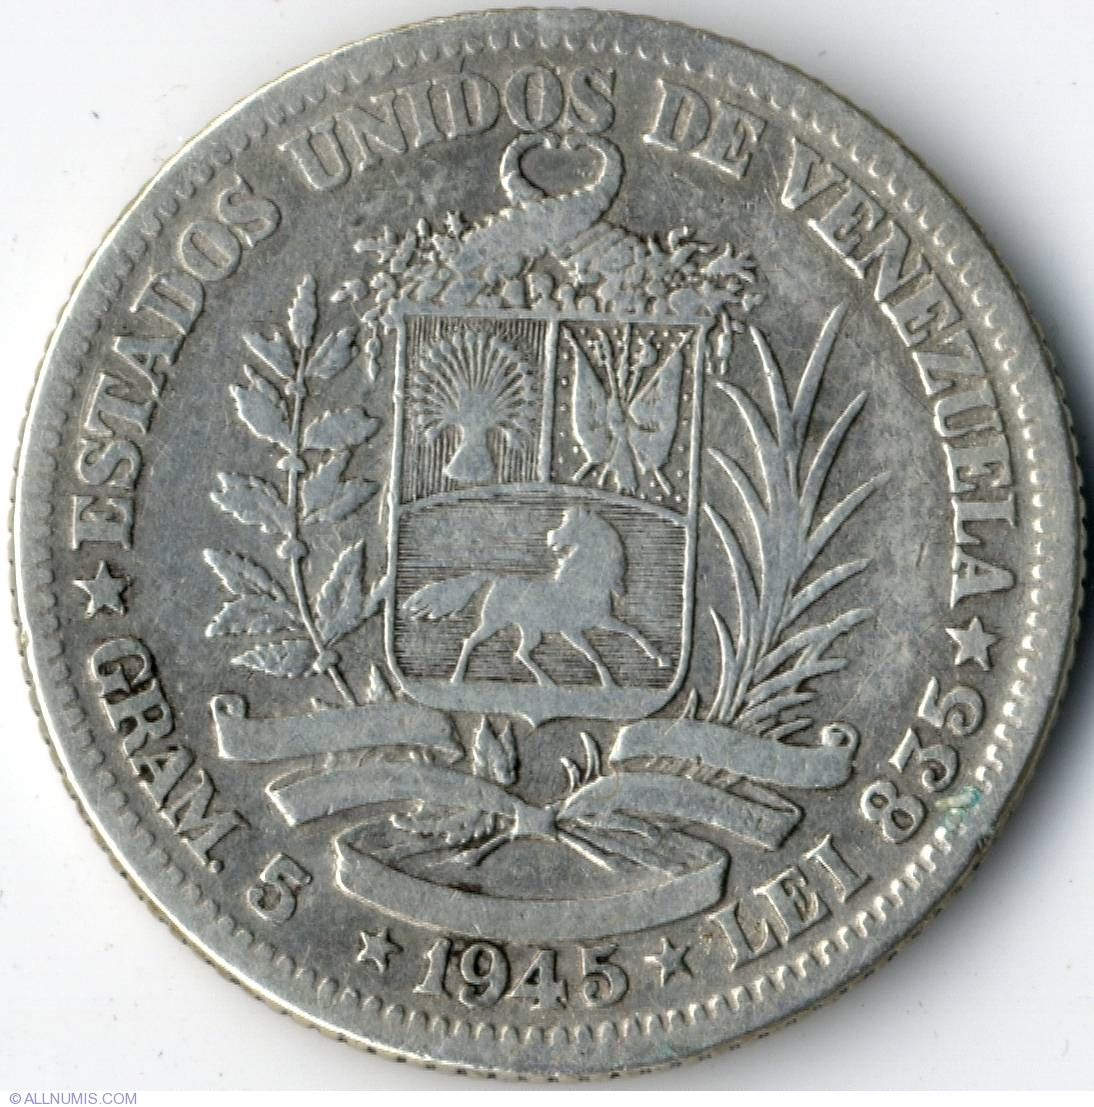 1 Bolivar 1945 Republic 1941 1950 Venezuela Coin